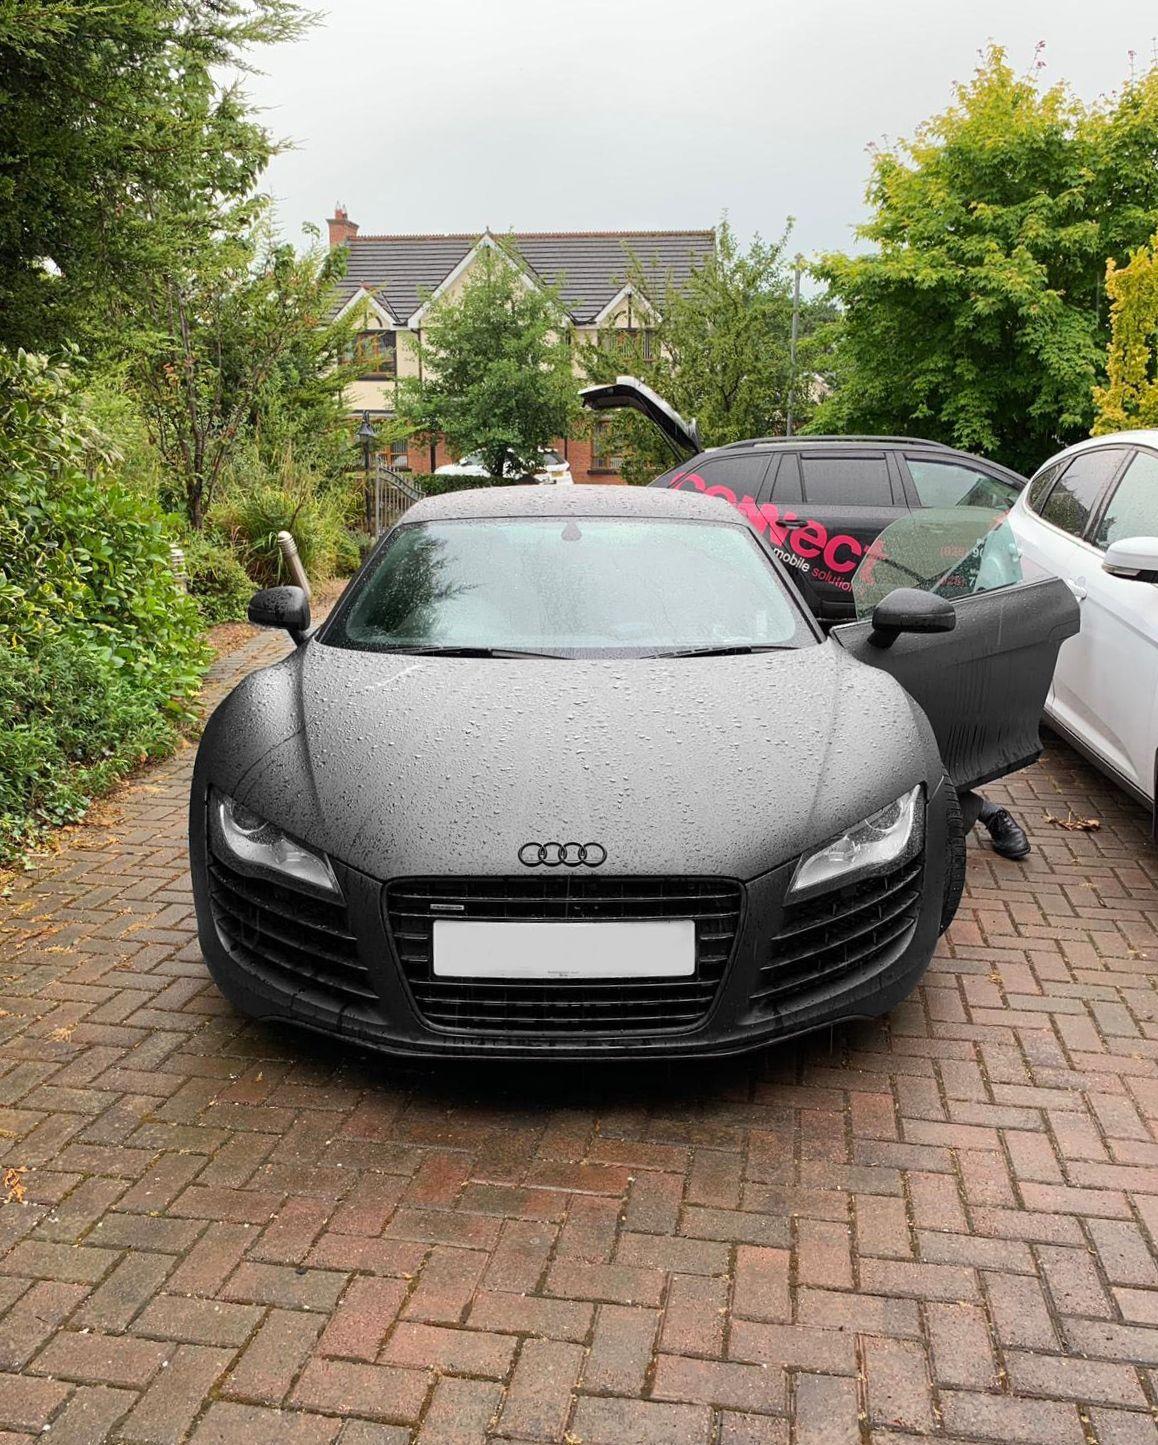 Audi R8 Matte Black before installing Apple Carplay